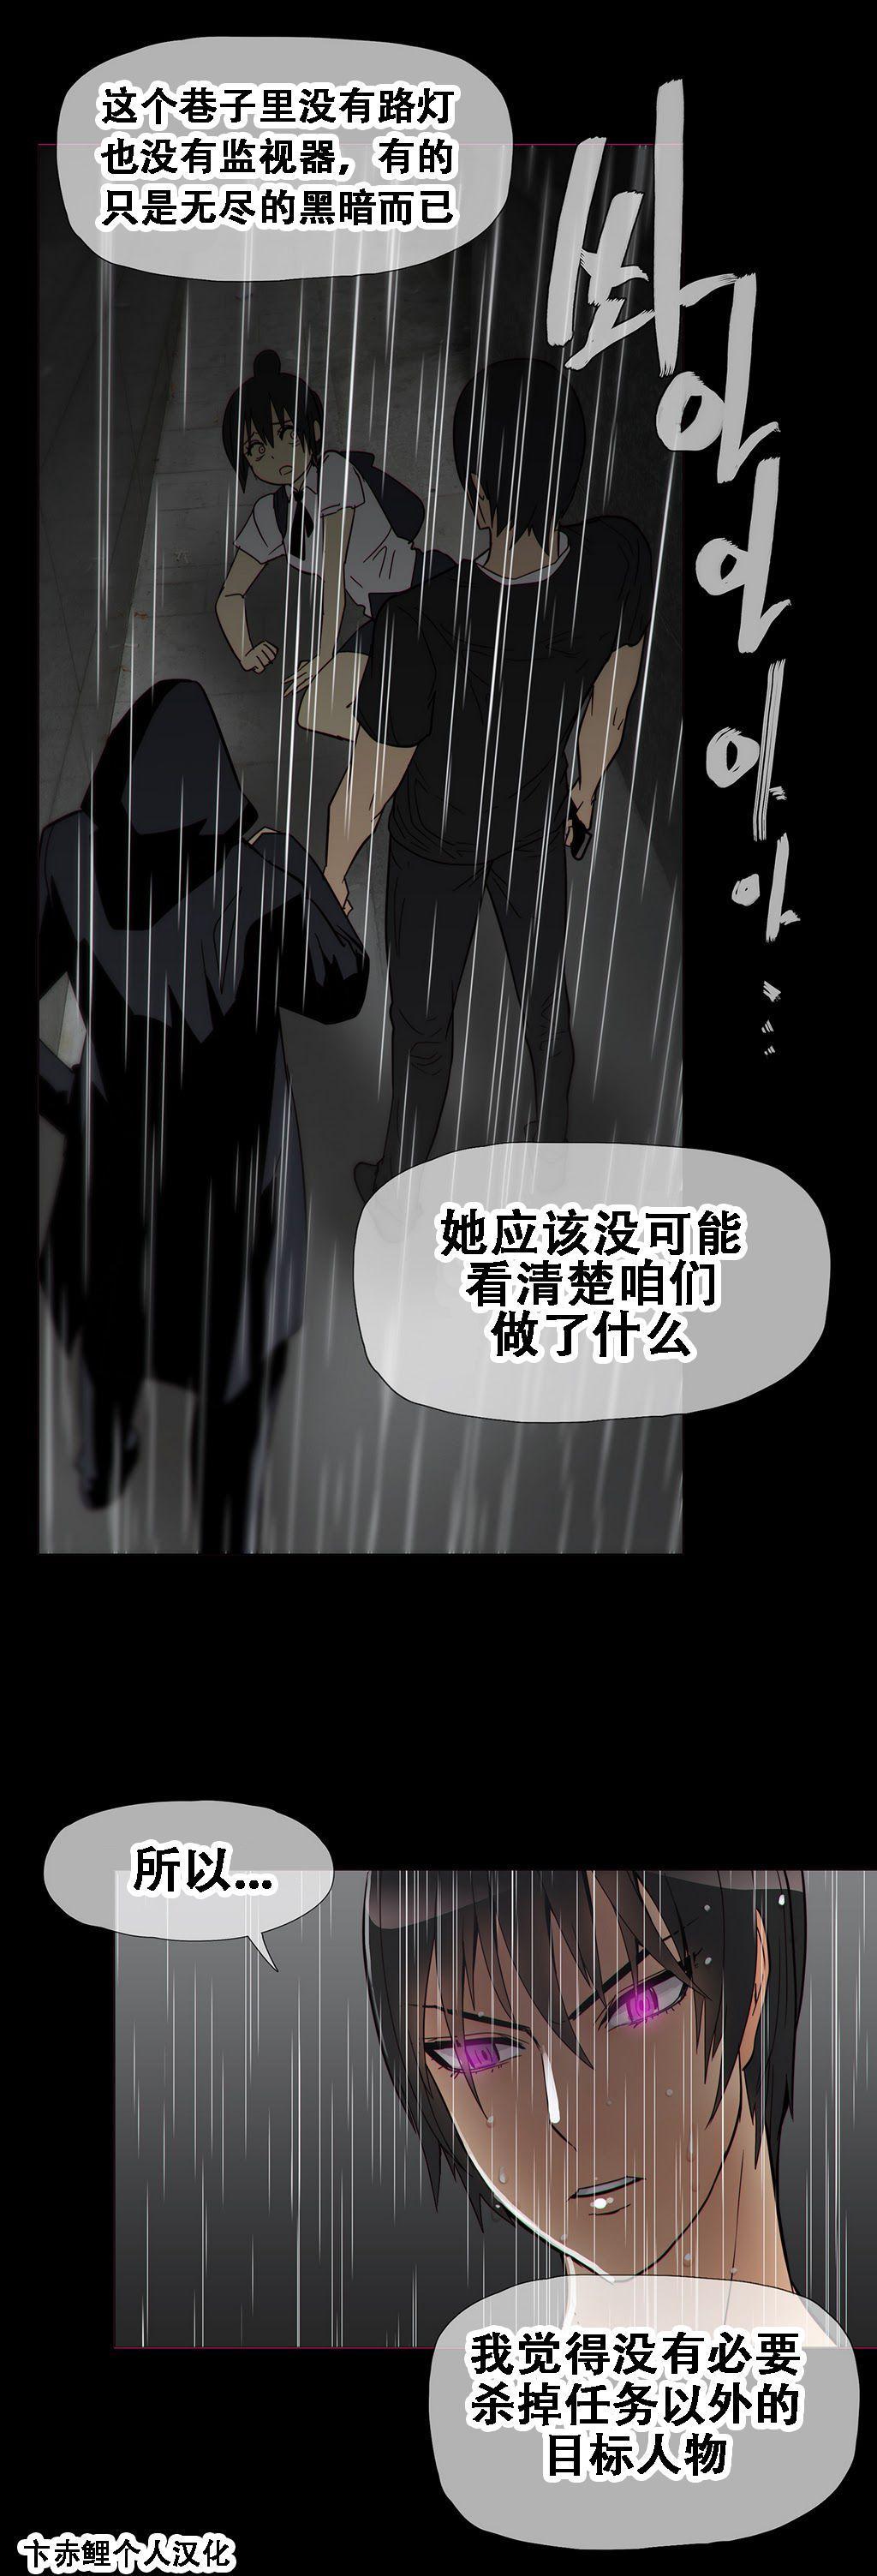 HouseHold Affairs 【卞赤鲤个人汉化】1~21话(持续更新中) 333